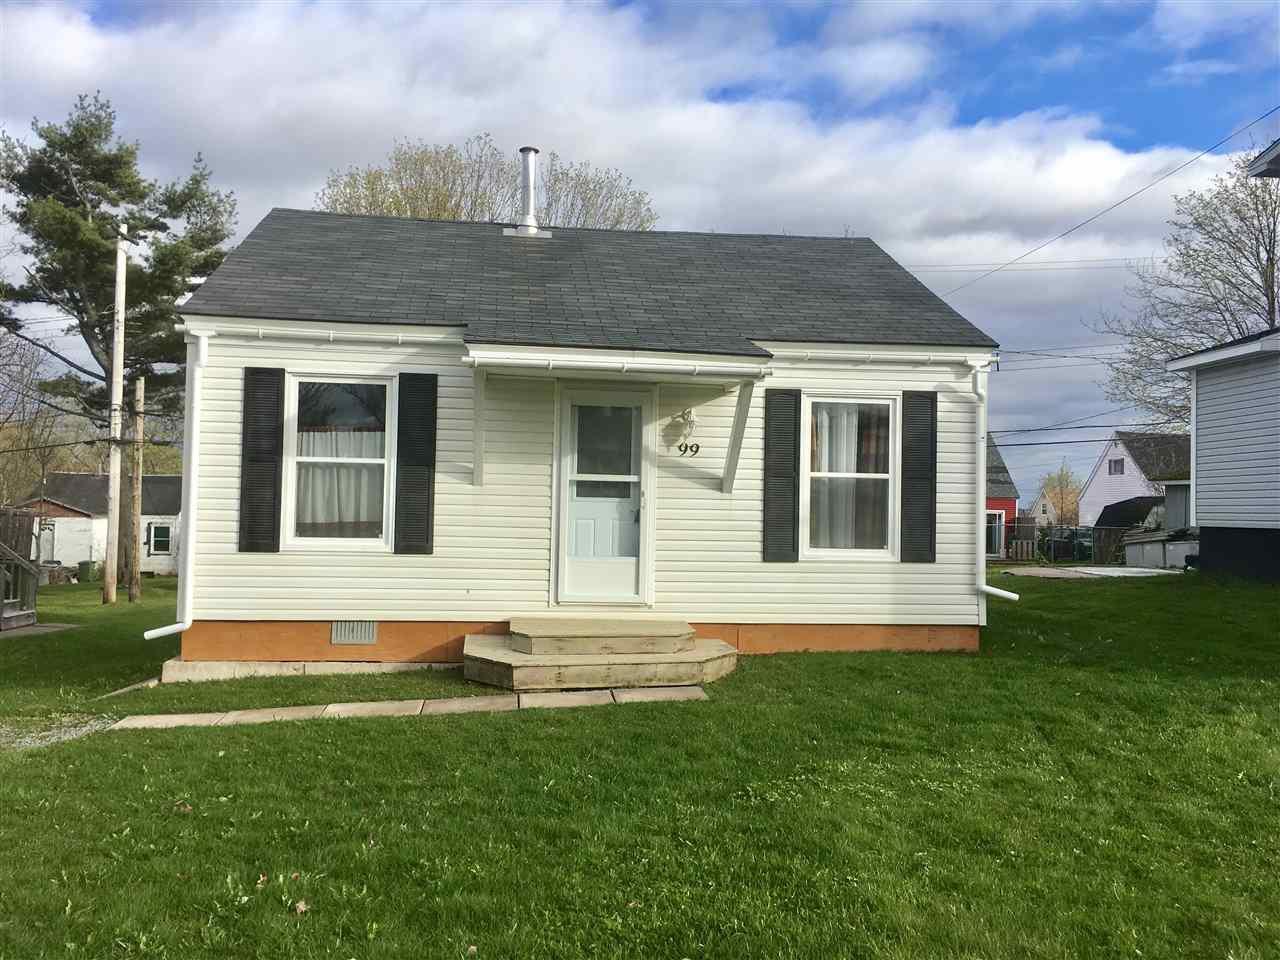 Main Photo: 99 Oak Street in Pictou: 107-Trenton,Westville,Pictou Residential for sale (Northern Region)  : MLS®# 201926673